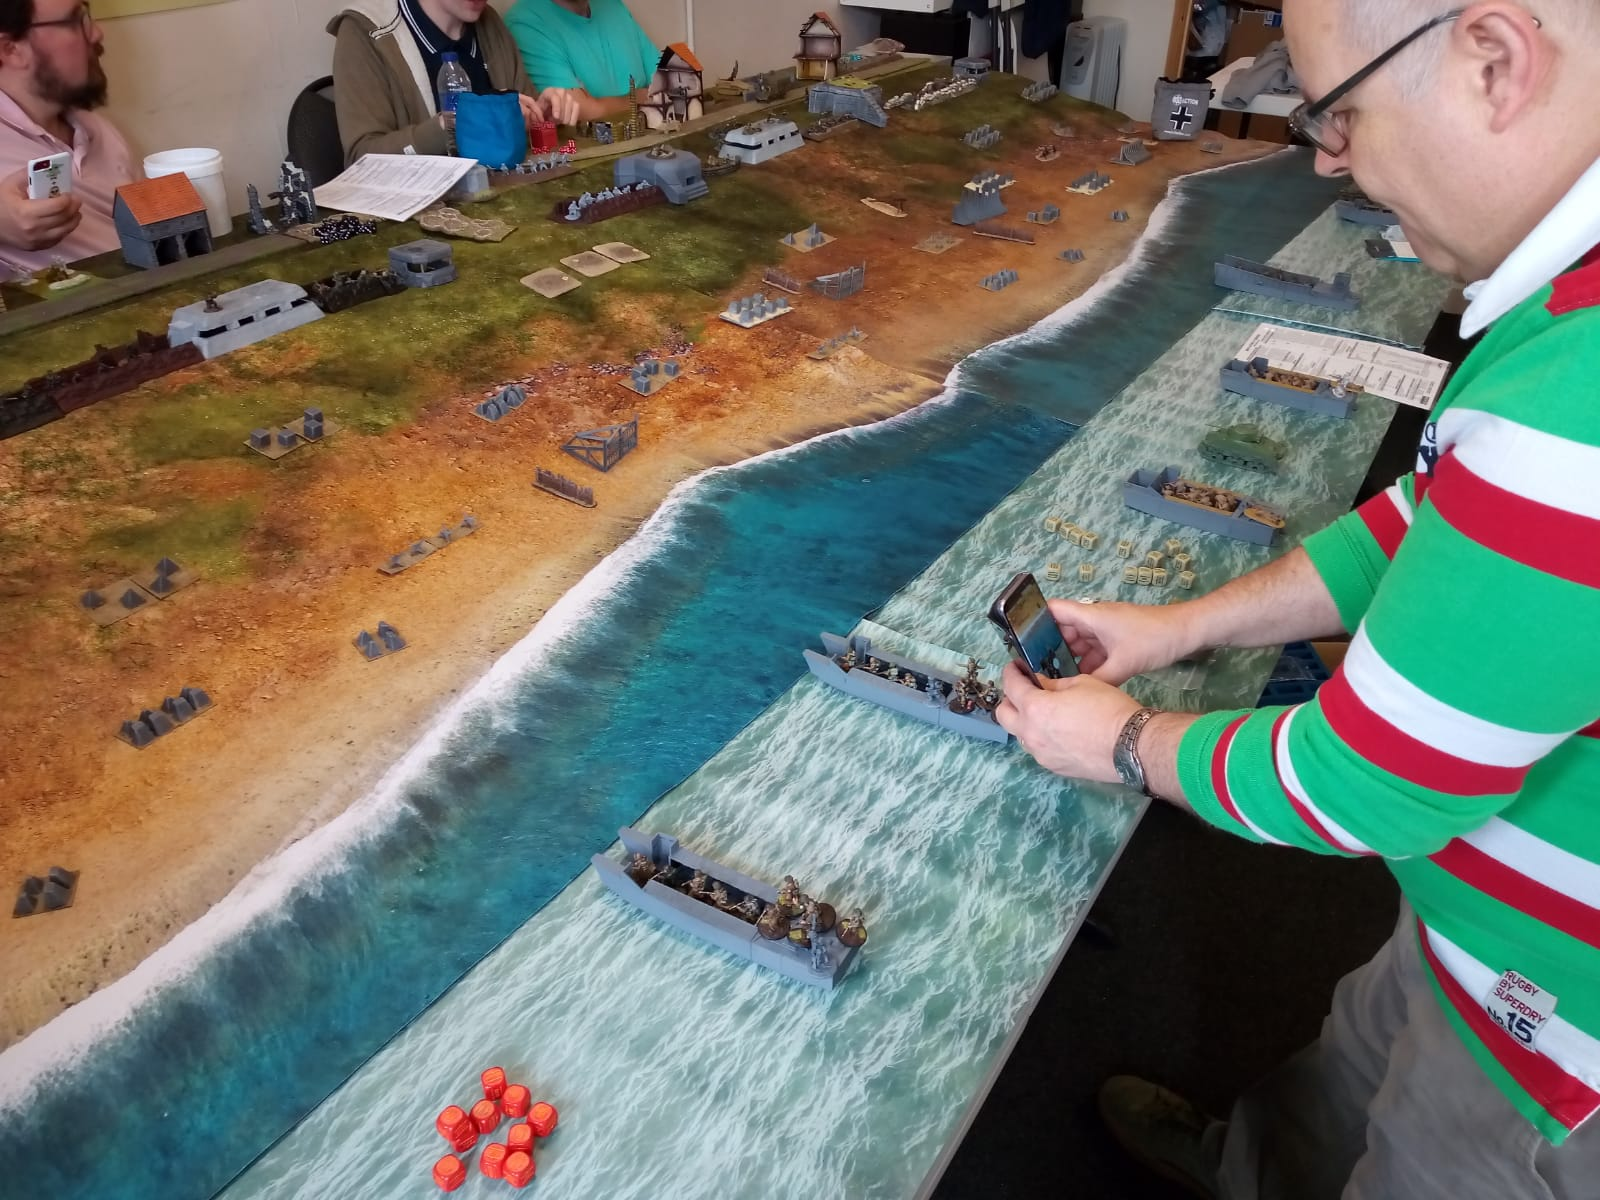 Uptielang versus Mismatched men in a fierce infantry engagement